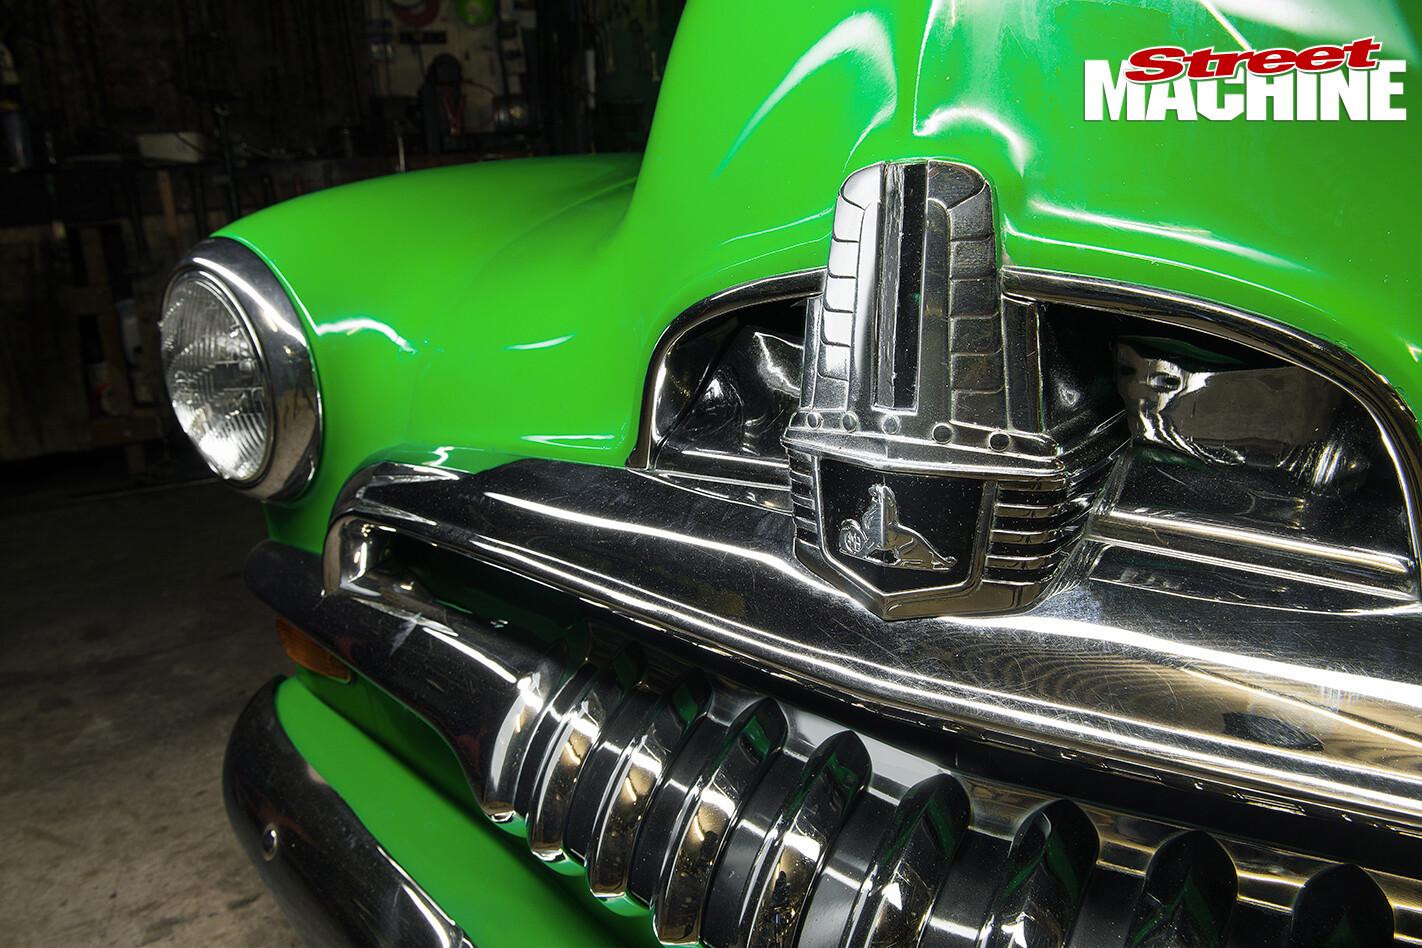 Holden -FJ-Utility -grille -detail